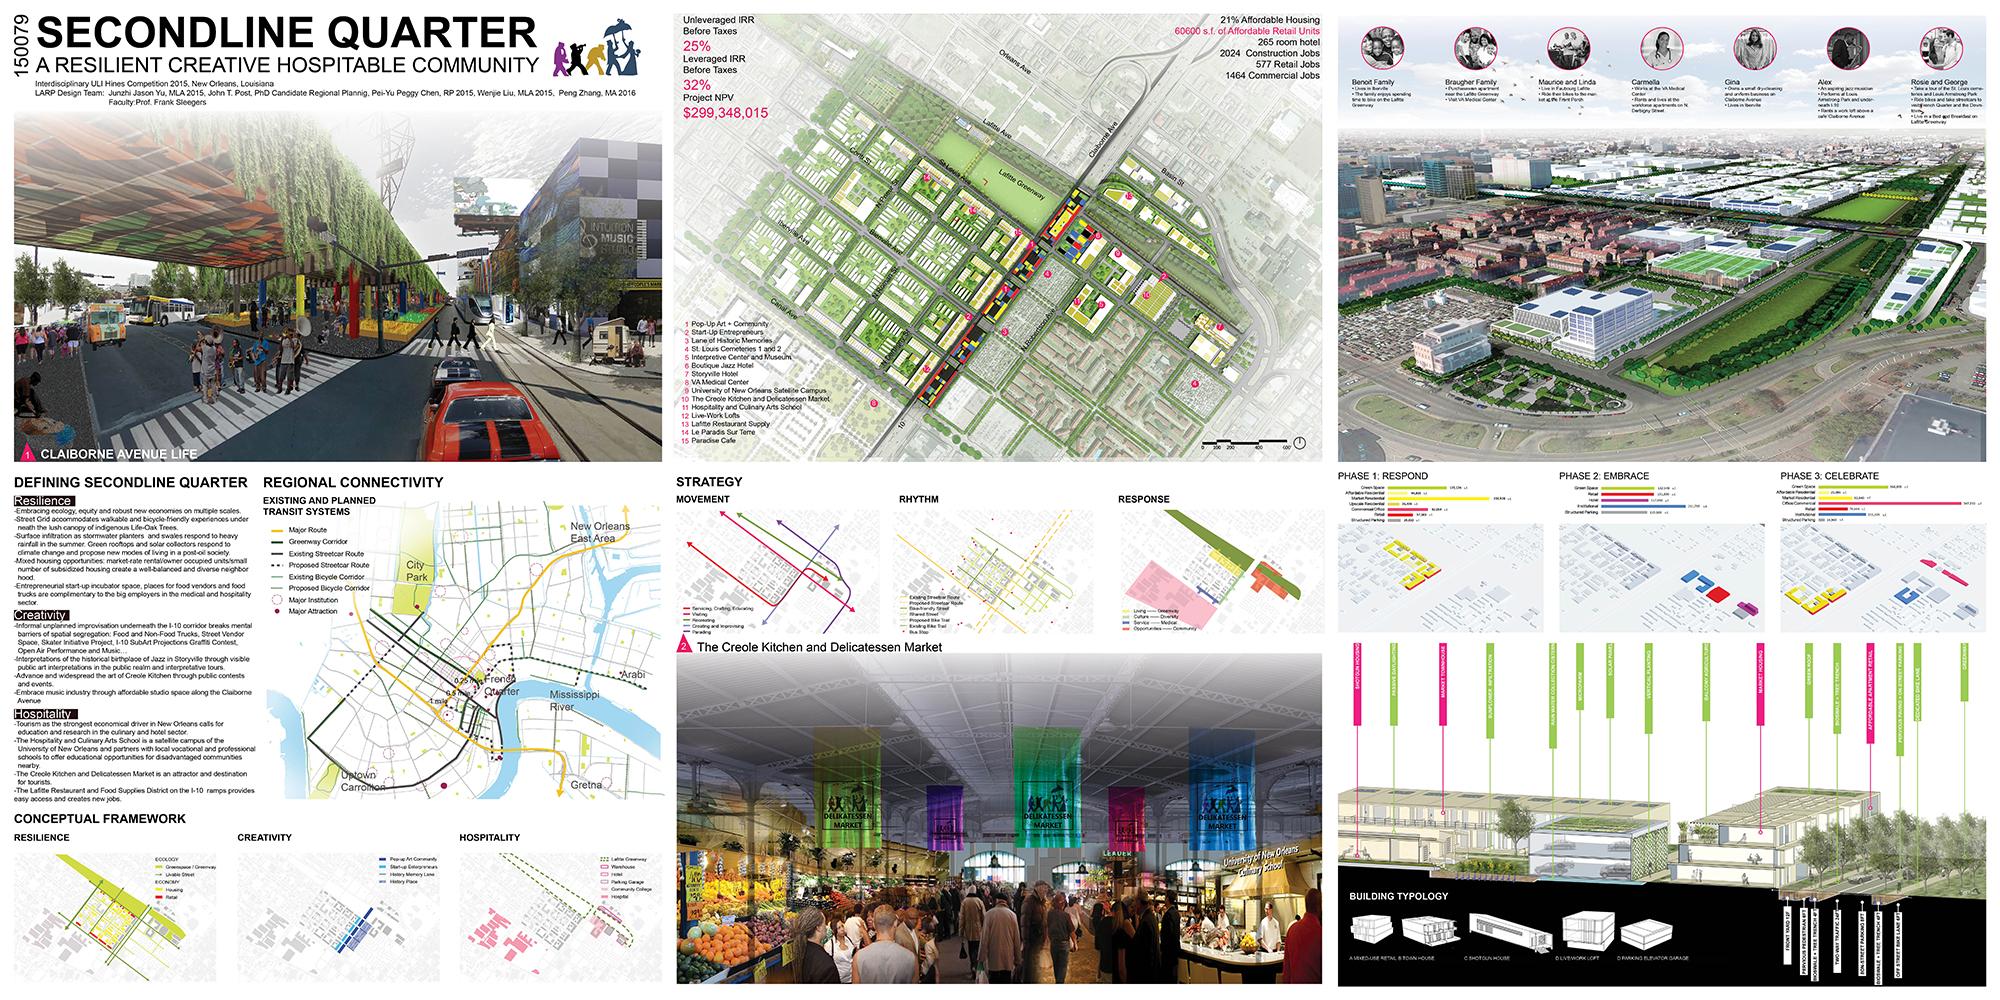 Design Team: Junzhi Jason Yu, MLA 2015; John T. Post, PhD Candidate Regional Plannig; Pei-Yu Peggy Chen, RP 2015; Wenjie Liu, MLA 2015; Peng Zhang, MA 2016